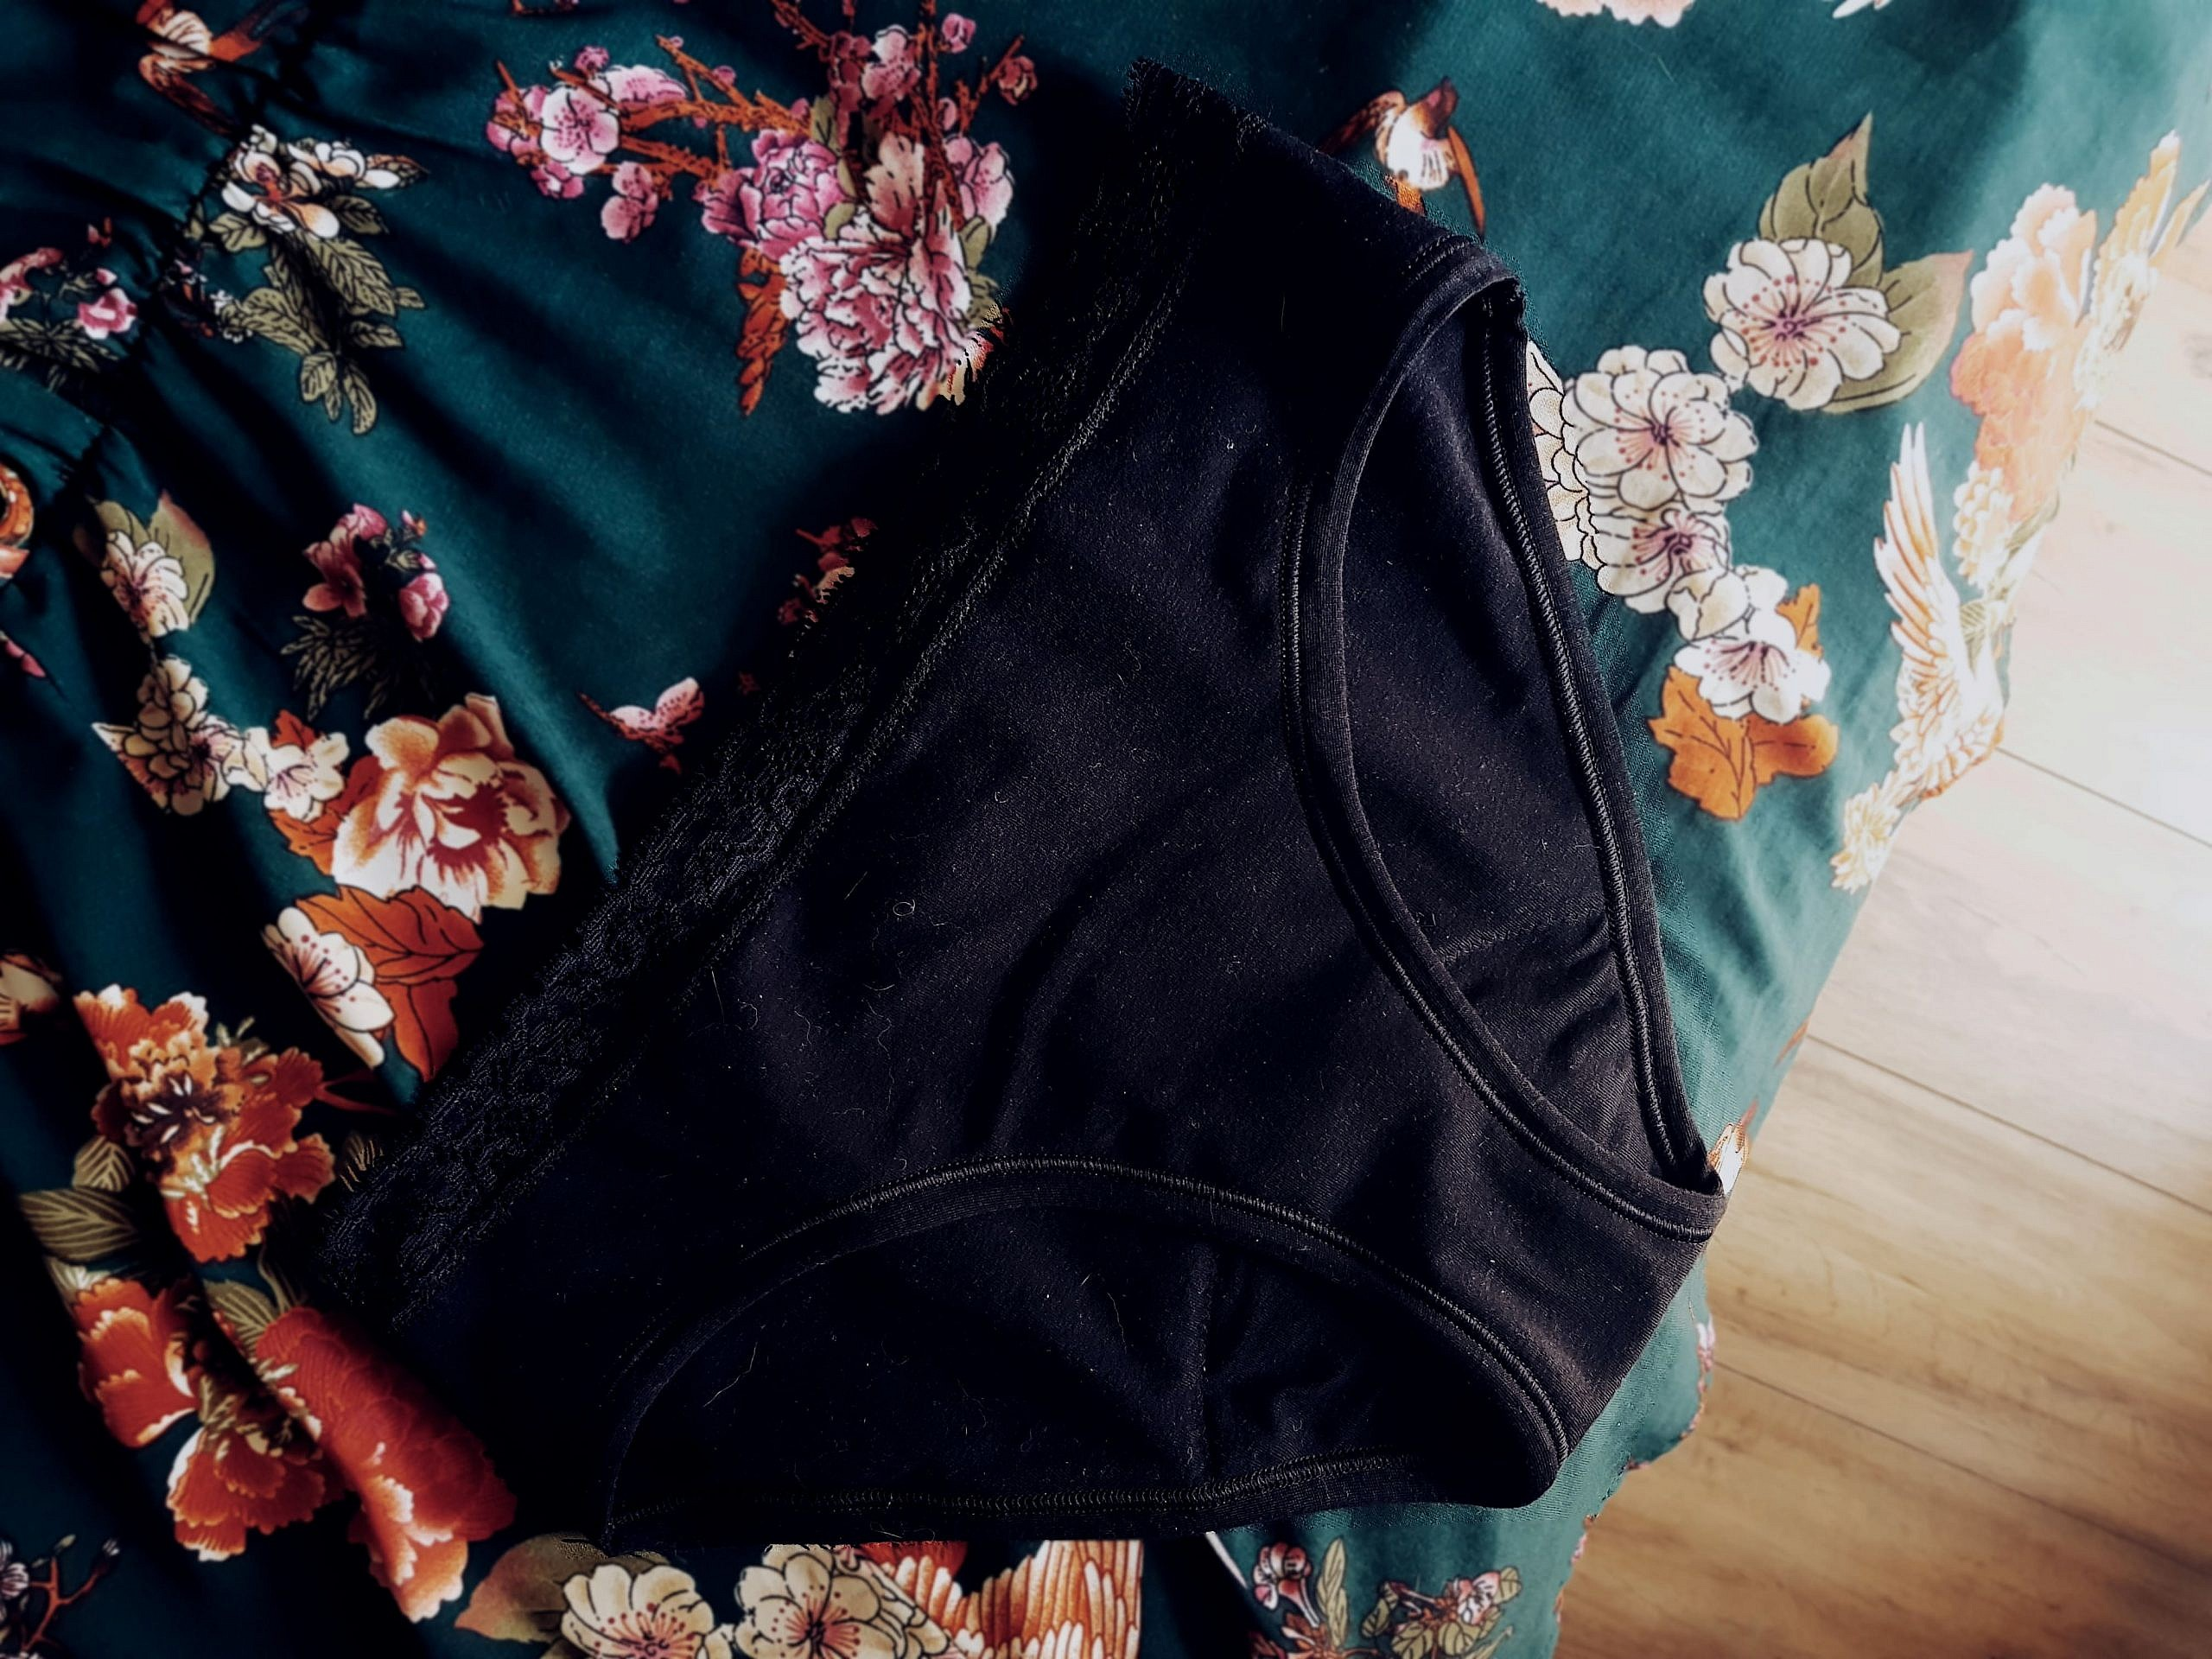 socup-culotte-menstruelle